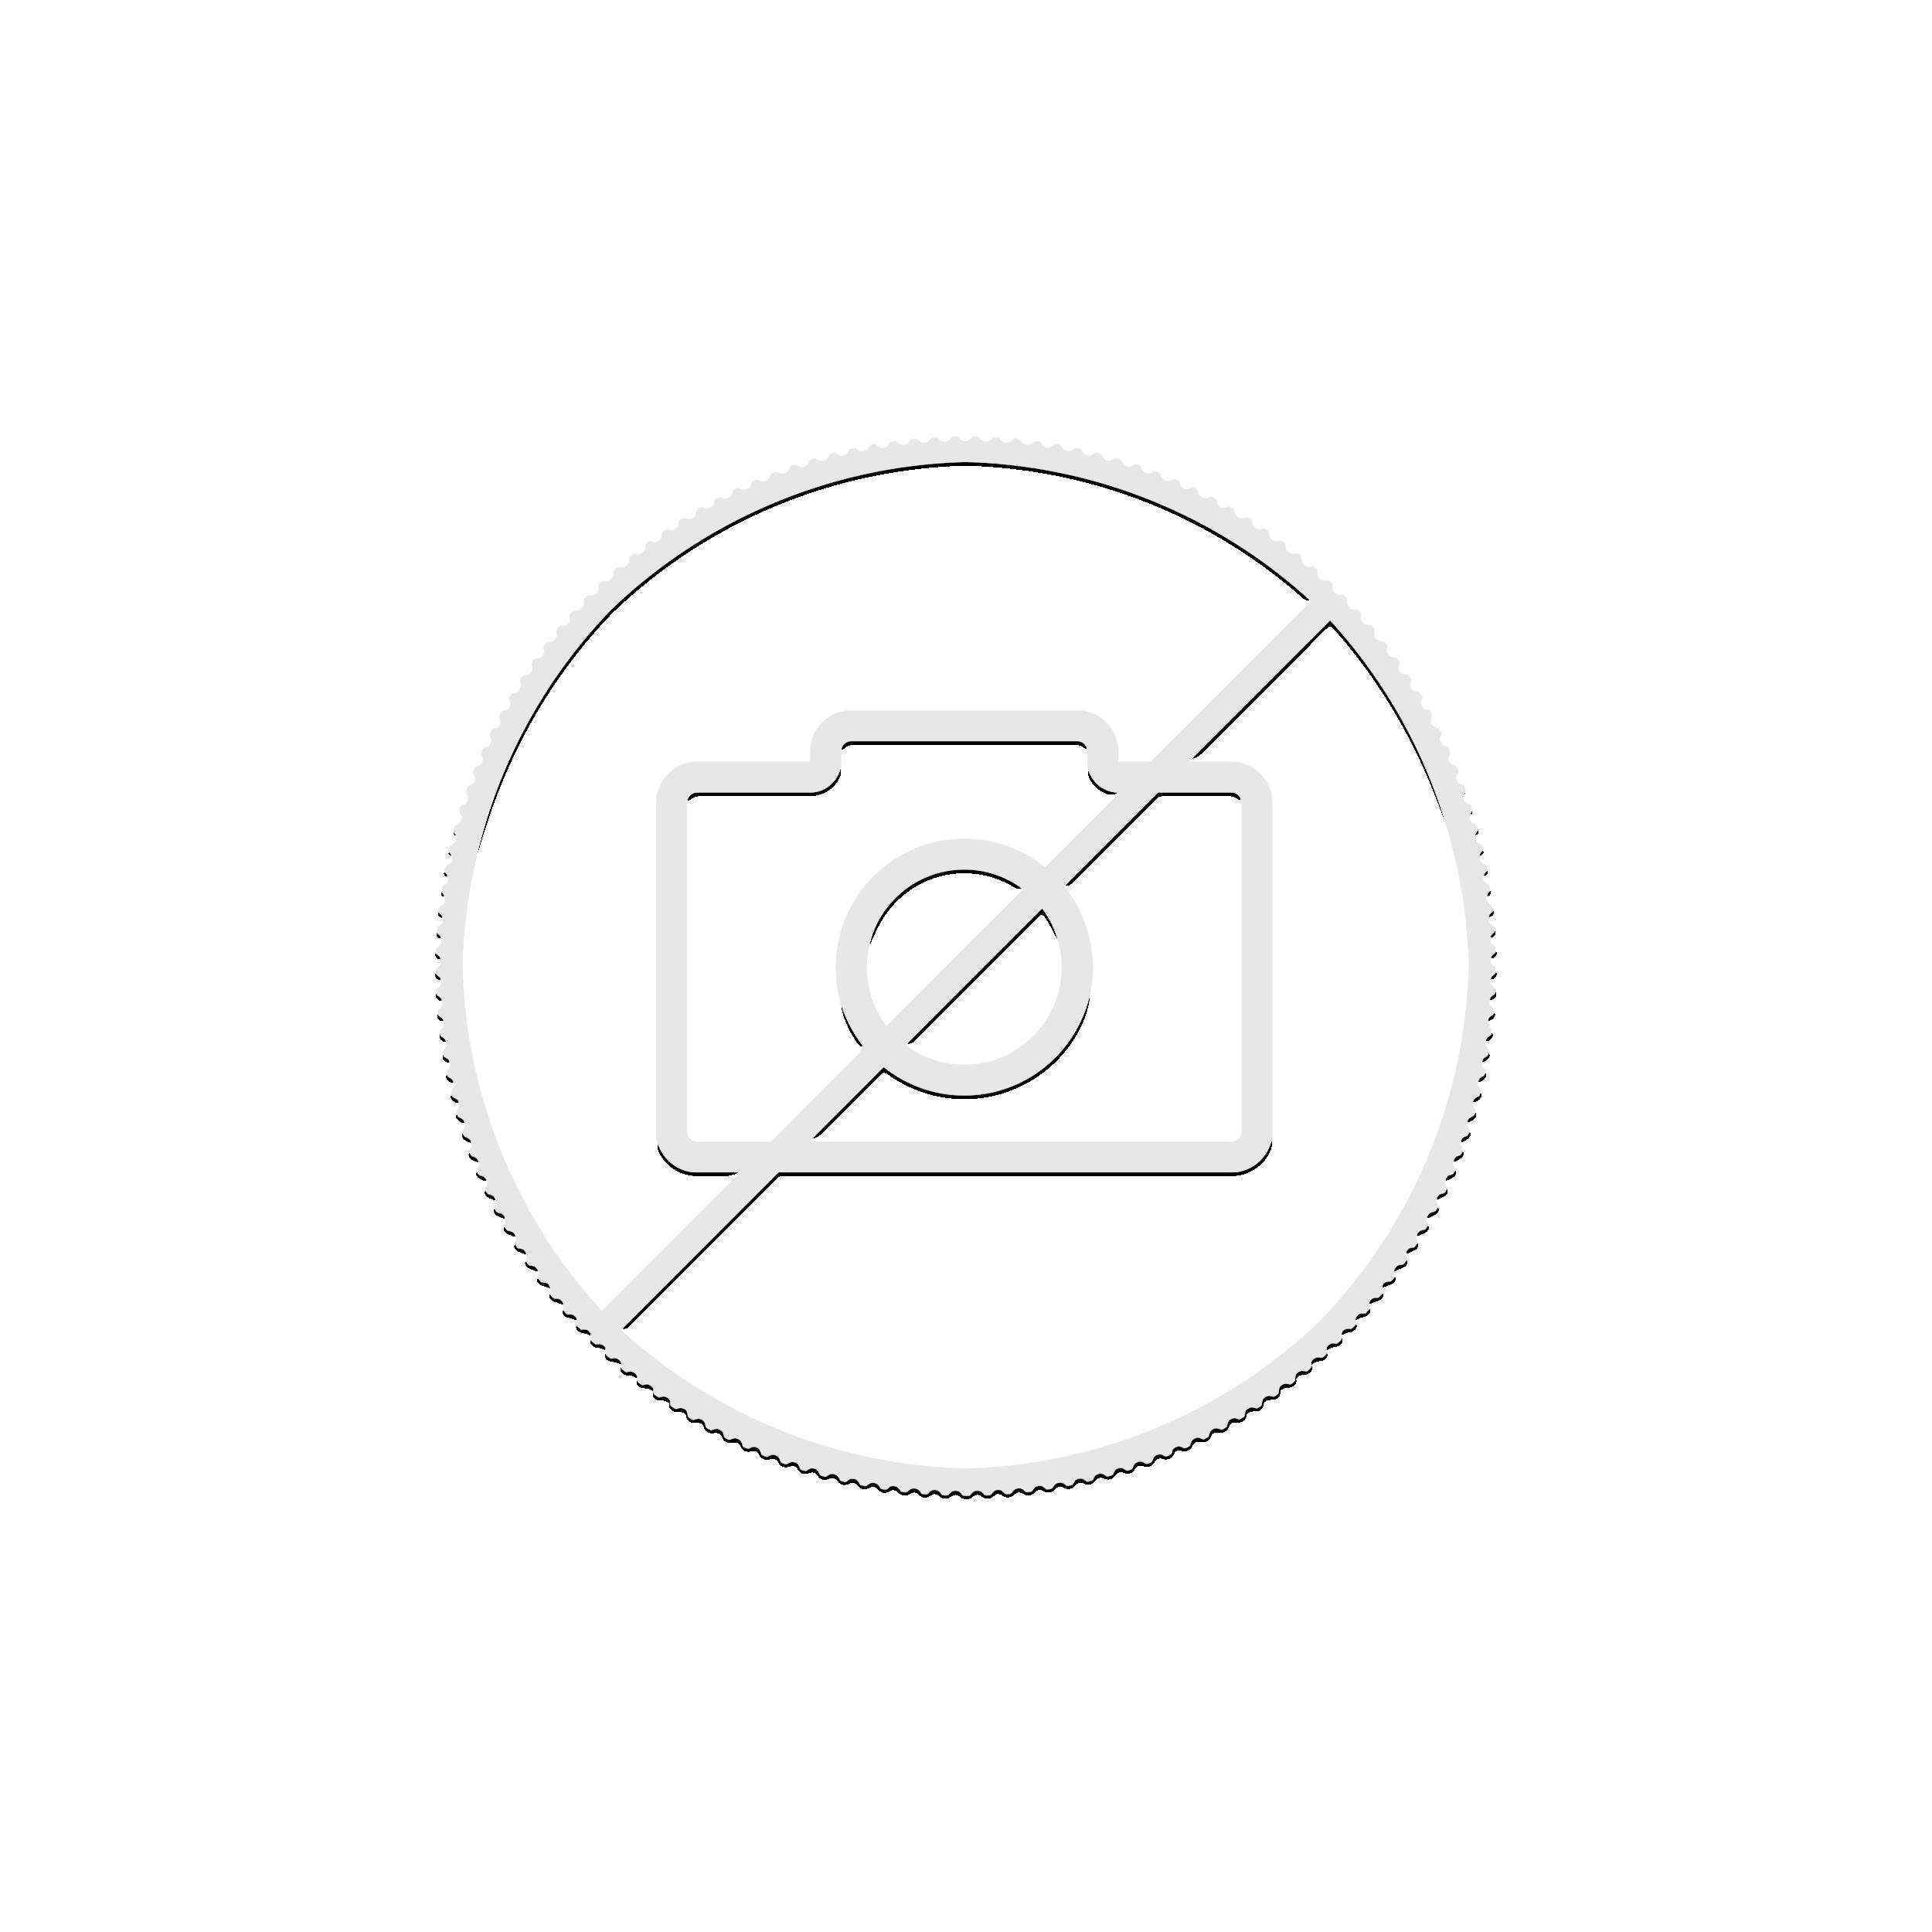 Gouden 1/10 troy ounce American Eagle munt 2021